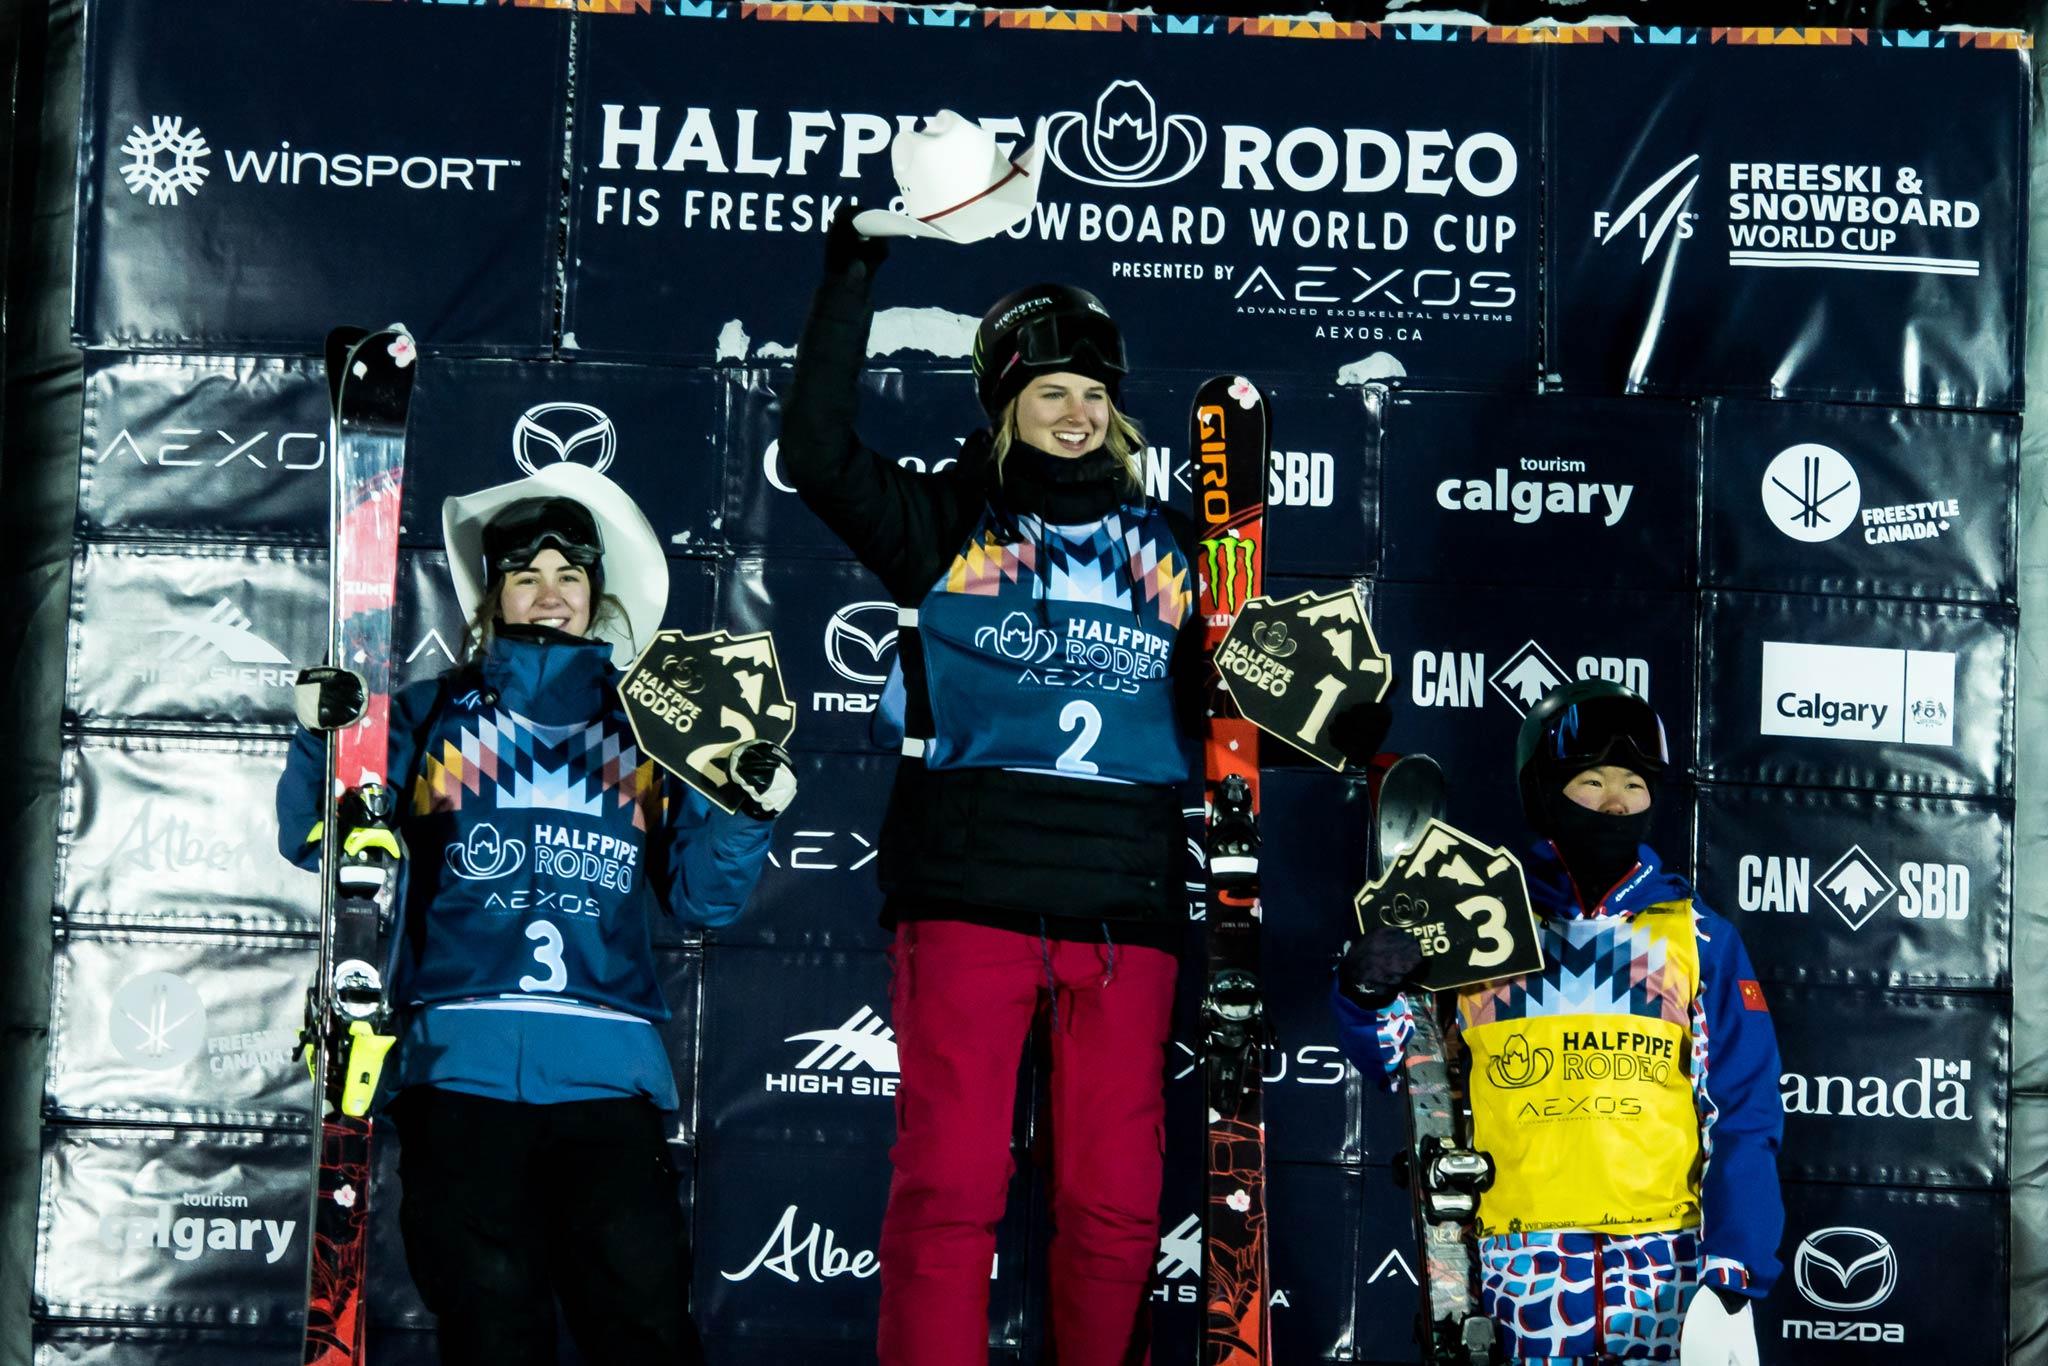 Die drei besten Frauen beim FIS Freestyle Halfpipe World Cup in Calgary: Rachael Karker (CAN), Cassie Sharpe (CAN), Zhang Kexin (CHN) Foto: Mateusz Kielpinski / FIS